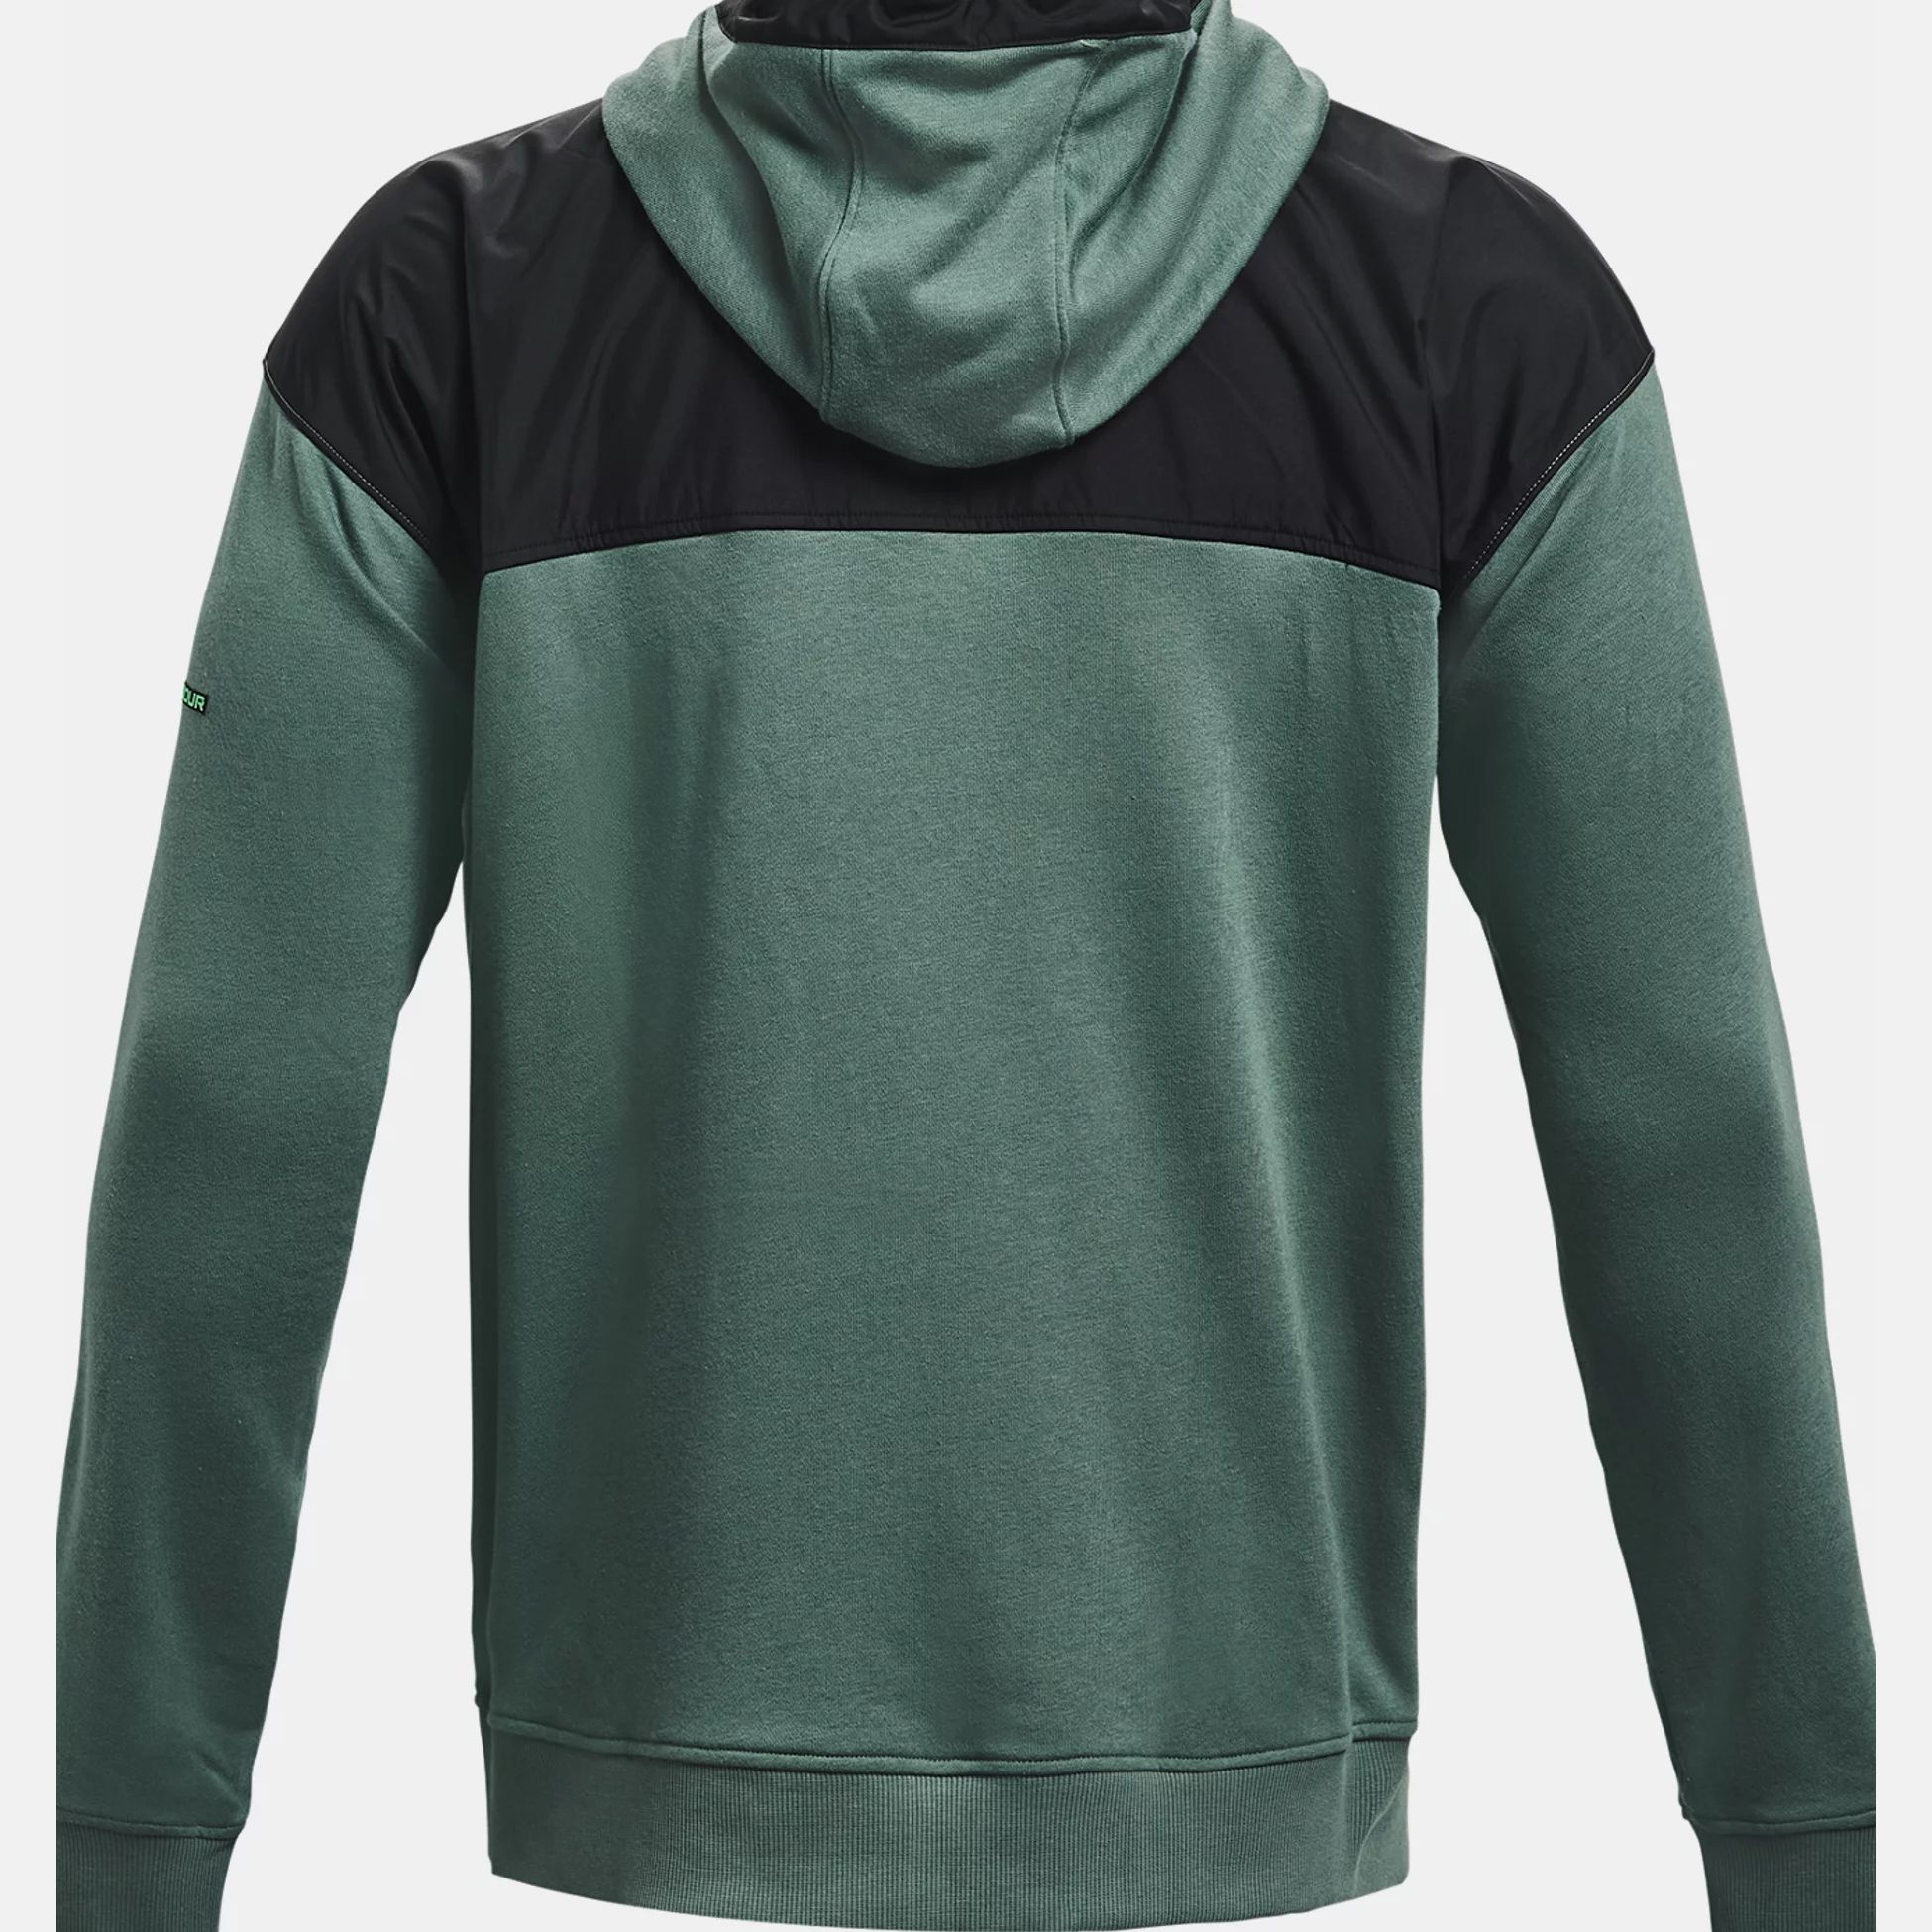 Îmbrăcăminte -  under armour UA Rival Terry AMP Full Zip Hoodie 1595